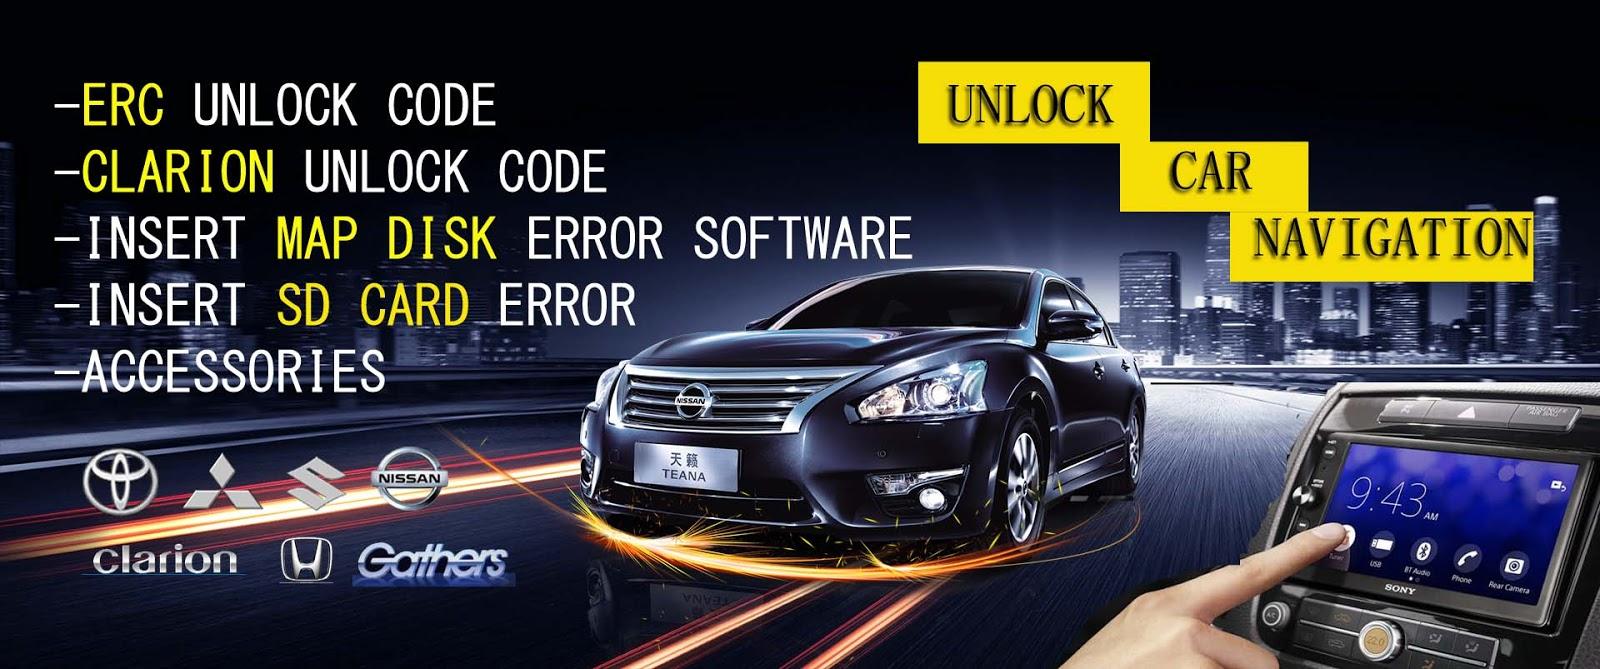 NavigationDisk | Car Radio Unlock | 日本のカーラジオロック解除ソリューション 42664043_1047636345413755_6321115321864290304_n Toyota - Mitsubishi -Nissan -Suzuki-Isuzu- Honda map disk Toyota  map disk error insert map disk solution